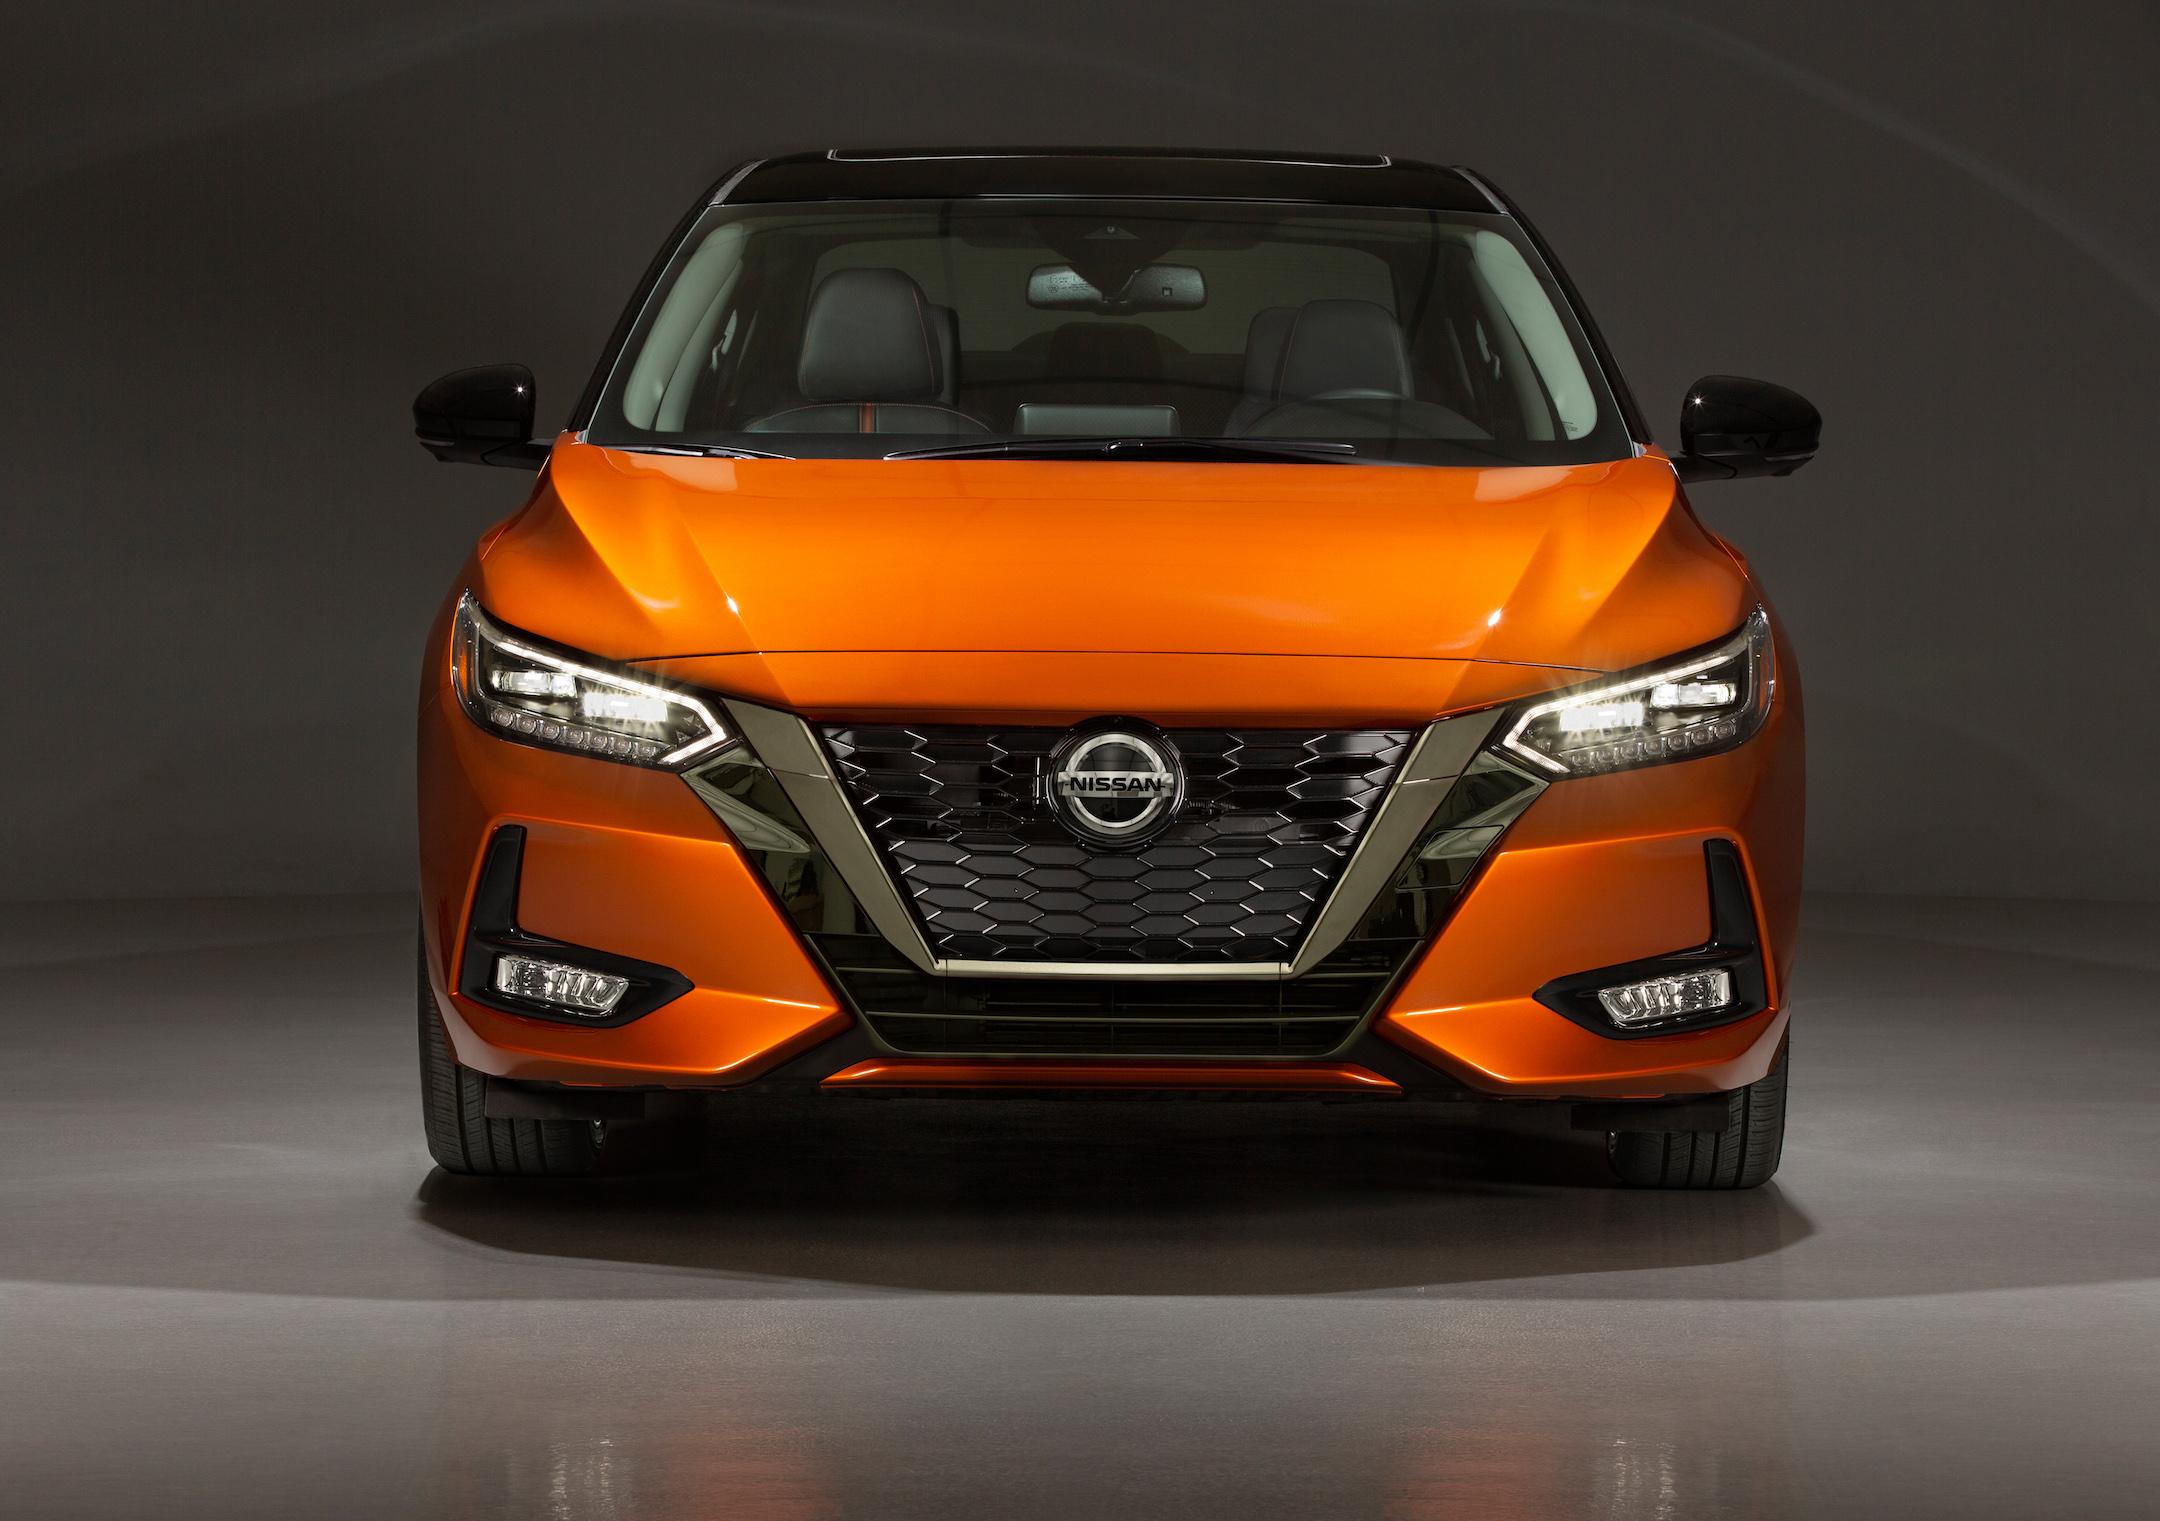 2020 Nissan Sentra_O-12-source